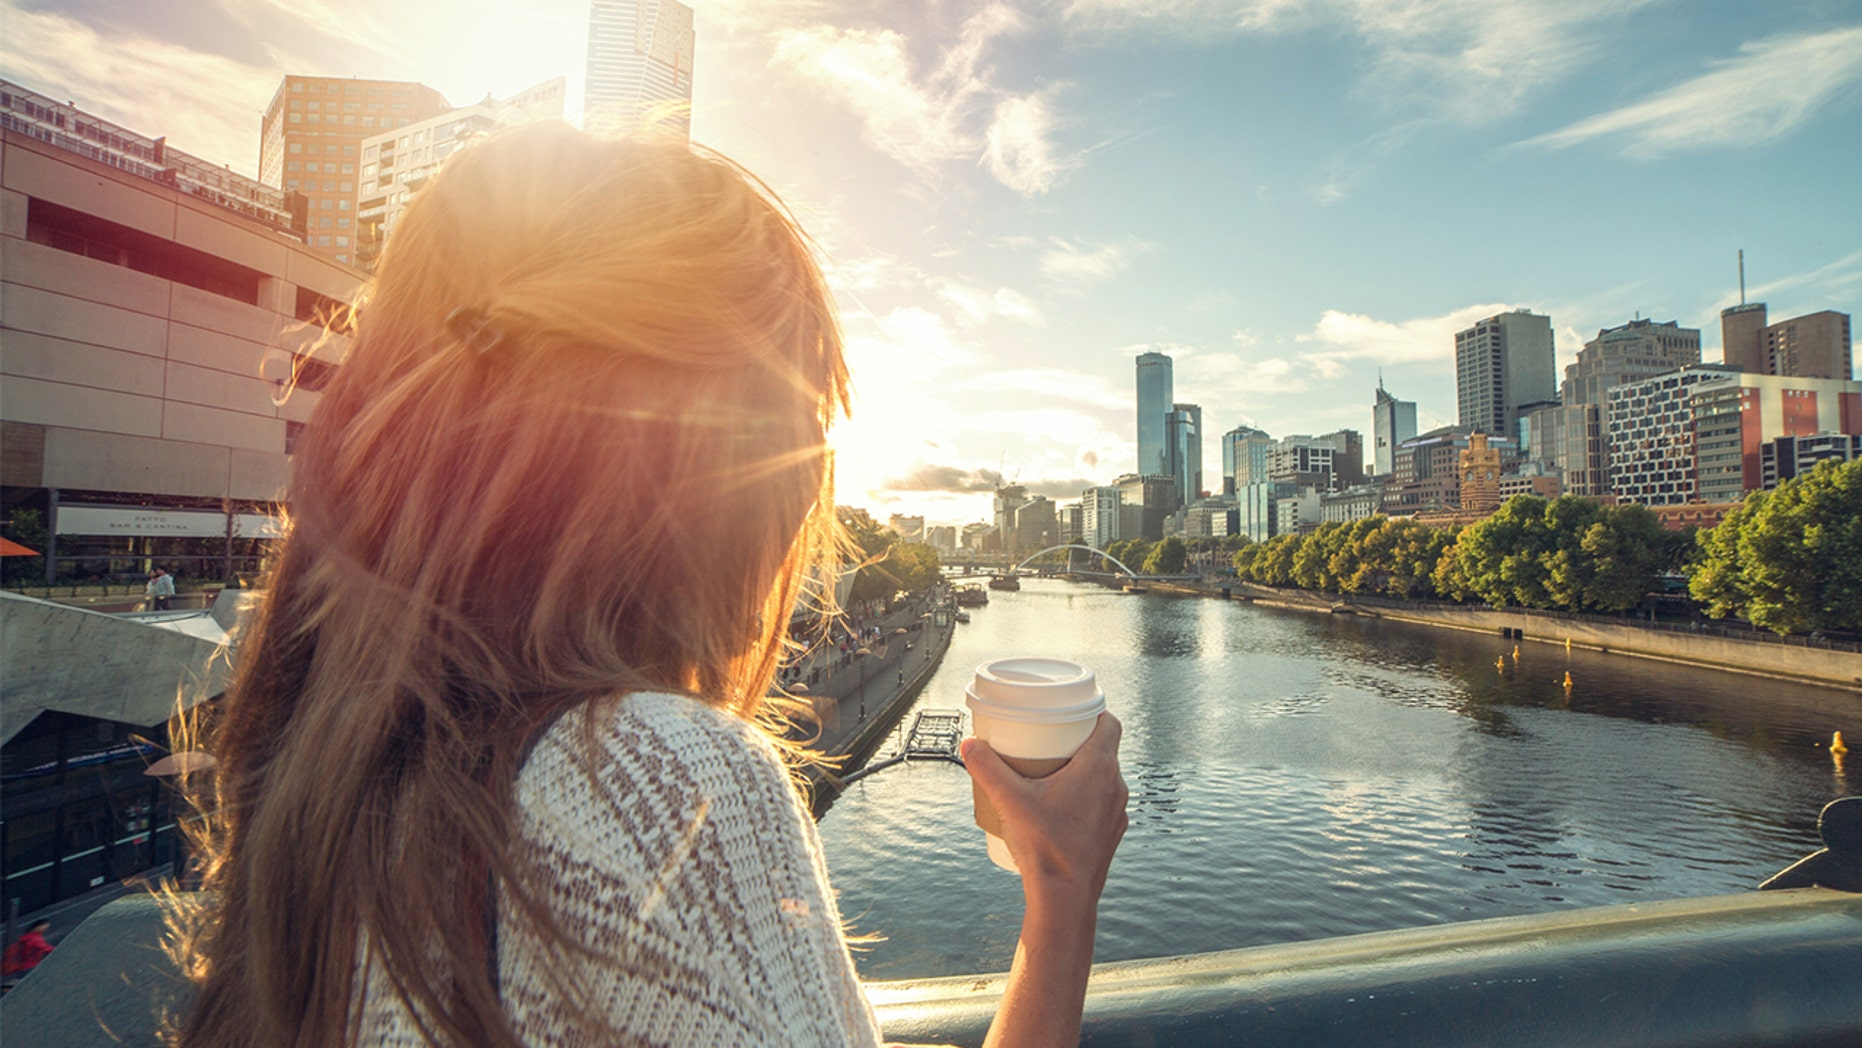 A woman enjoys the sunrise in Melbourne, Australia.